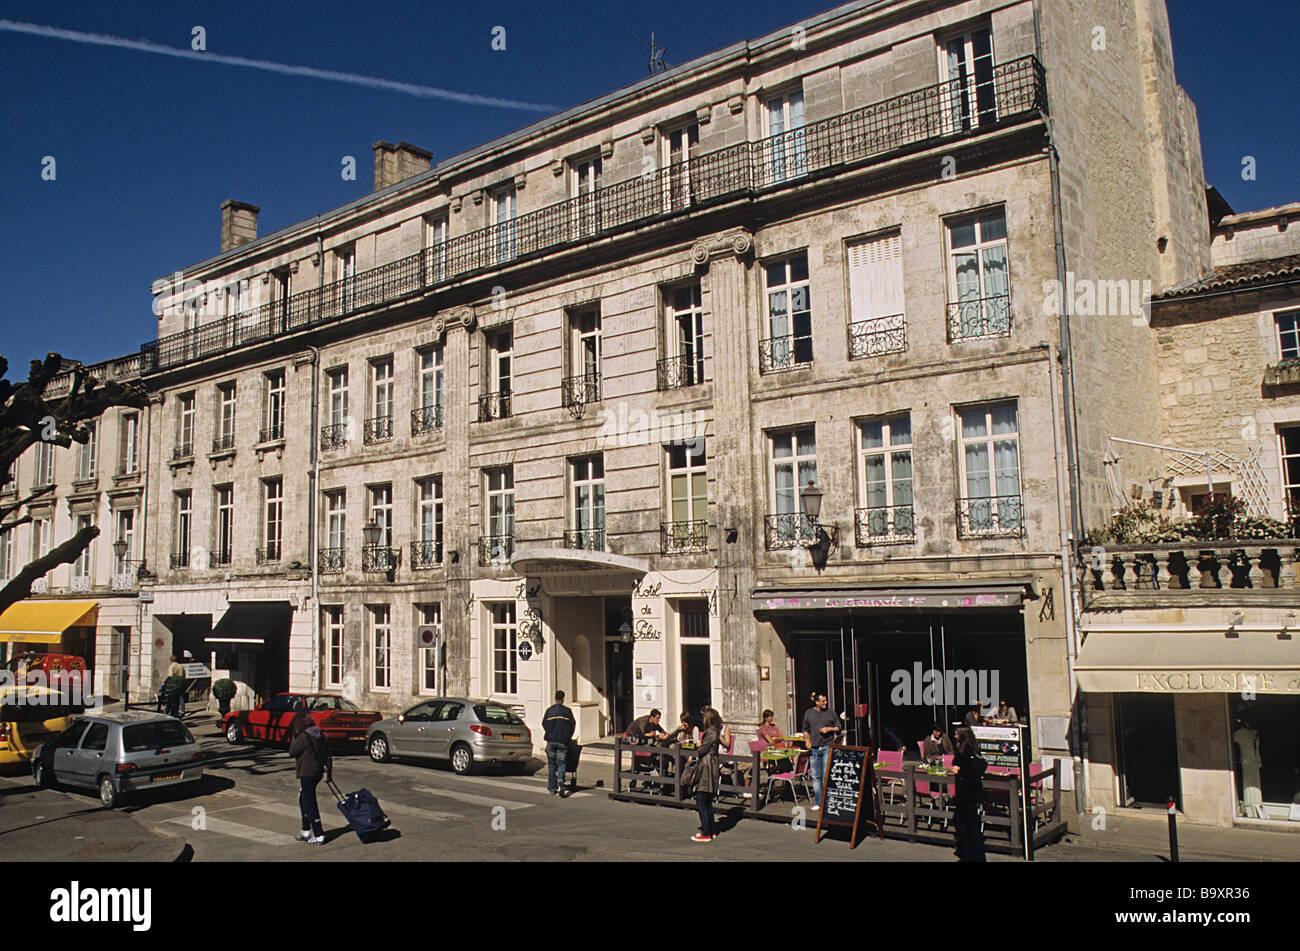 angouleme hotel du palais in place francis louvel stock. Black Bedroom Furniture Sets. Home Design Ideas